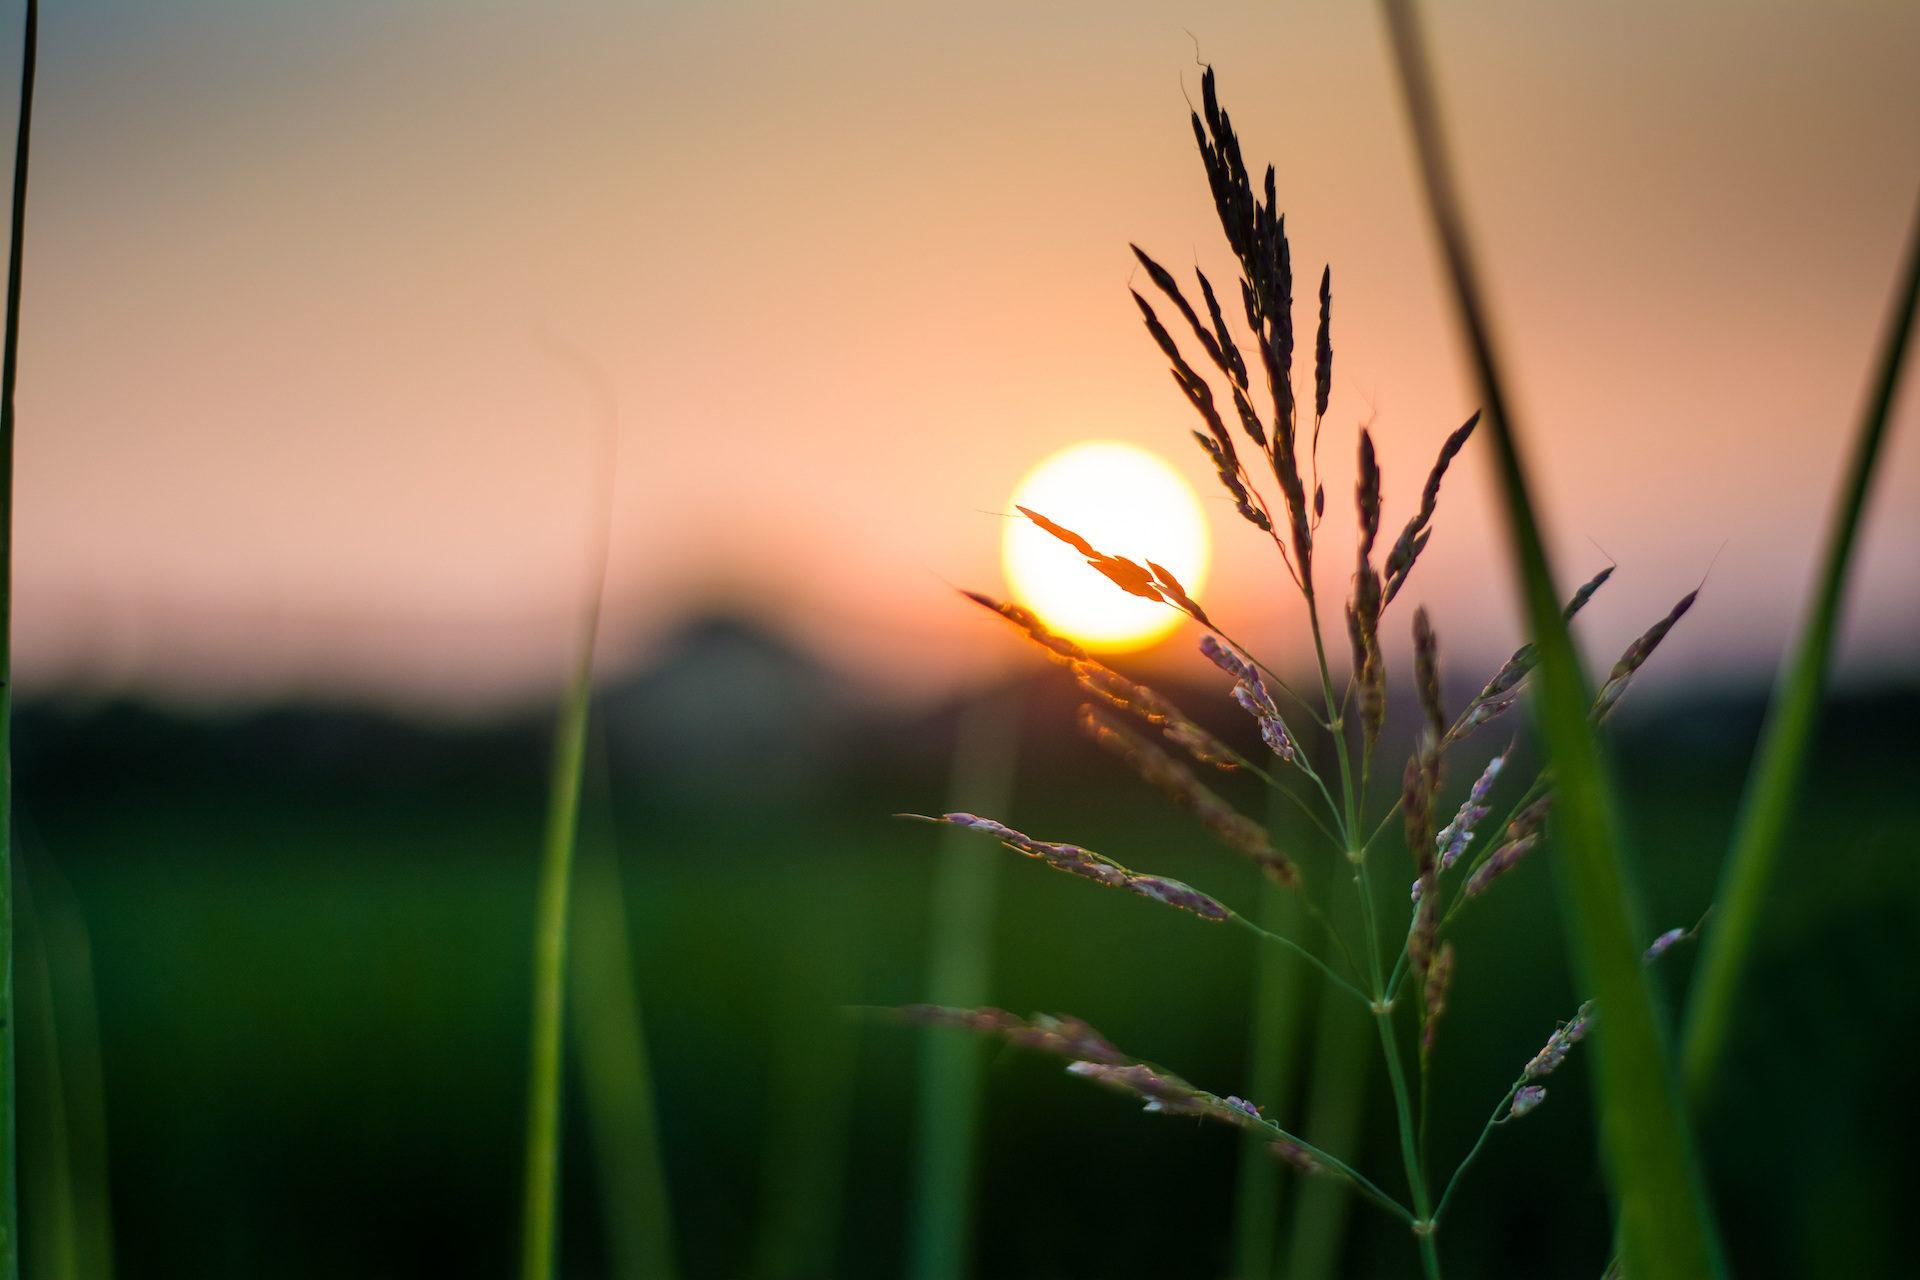 sol, brillo, atardecer, planta, verde - Fondos de Pantalla HD - professor-falken.com